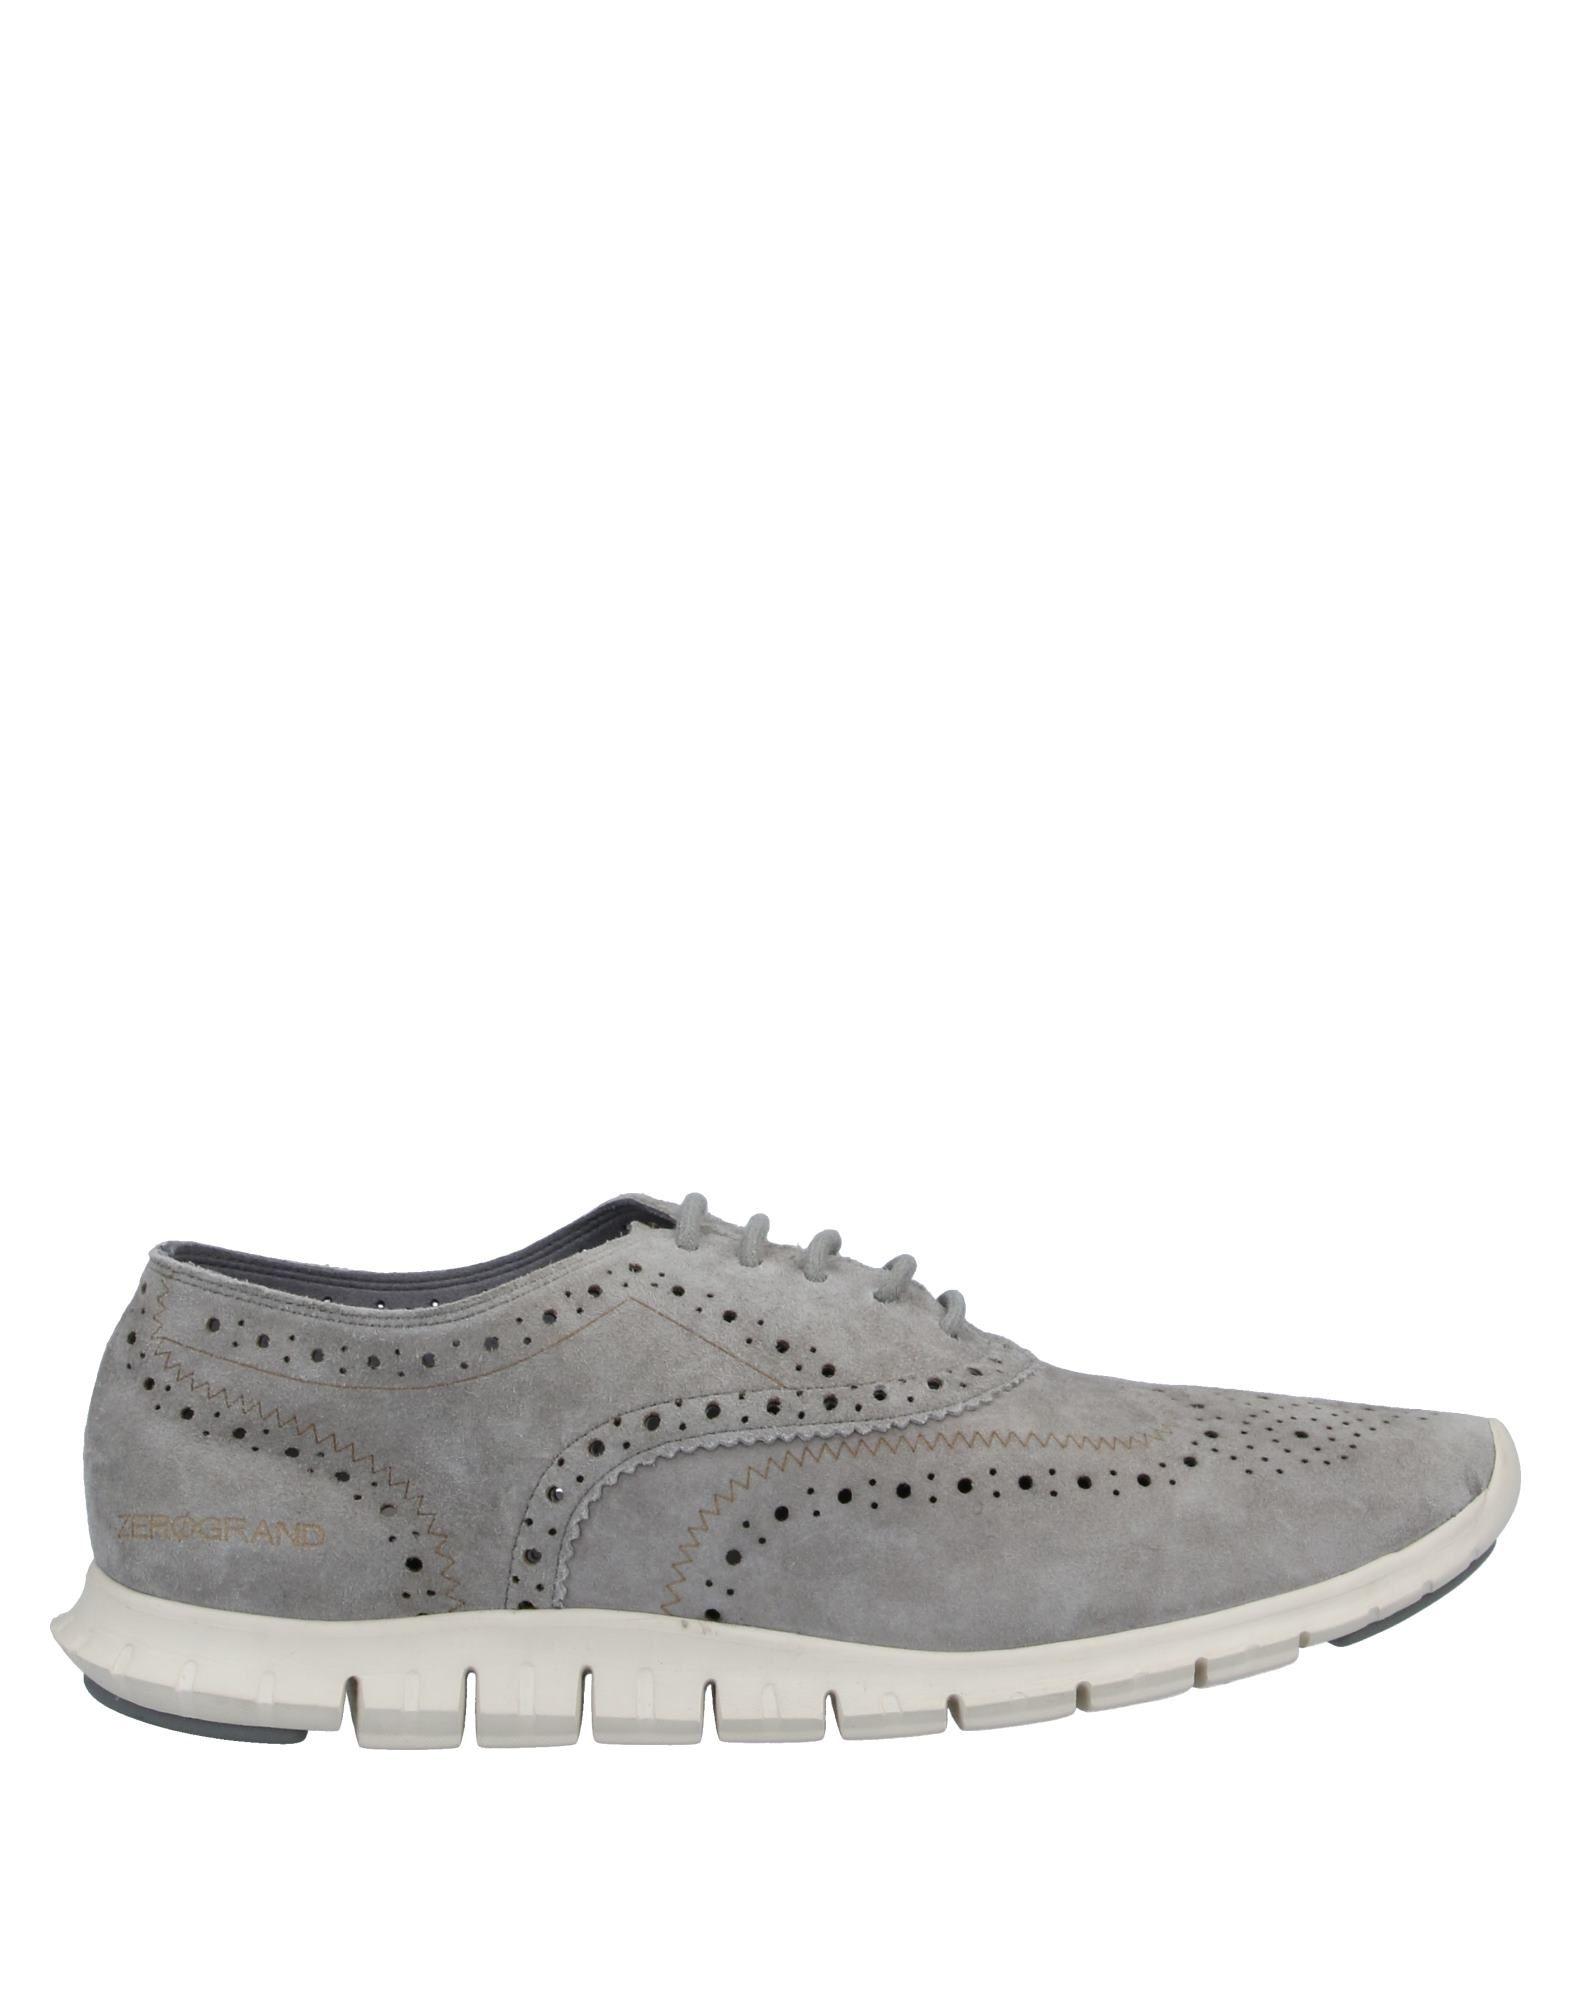 COLE HAAN Обувь на шнурках демисезонные ботинки cole haan khan cole haan2013